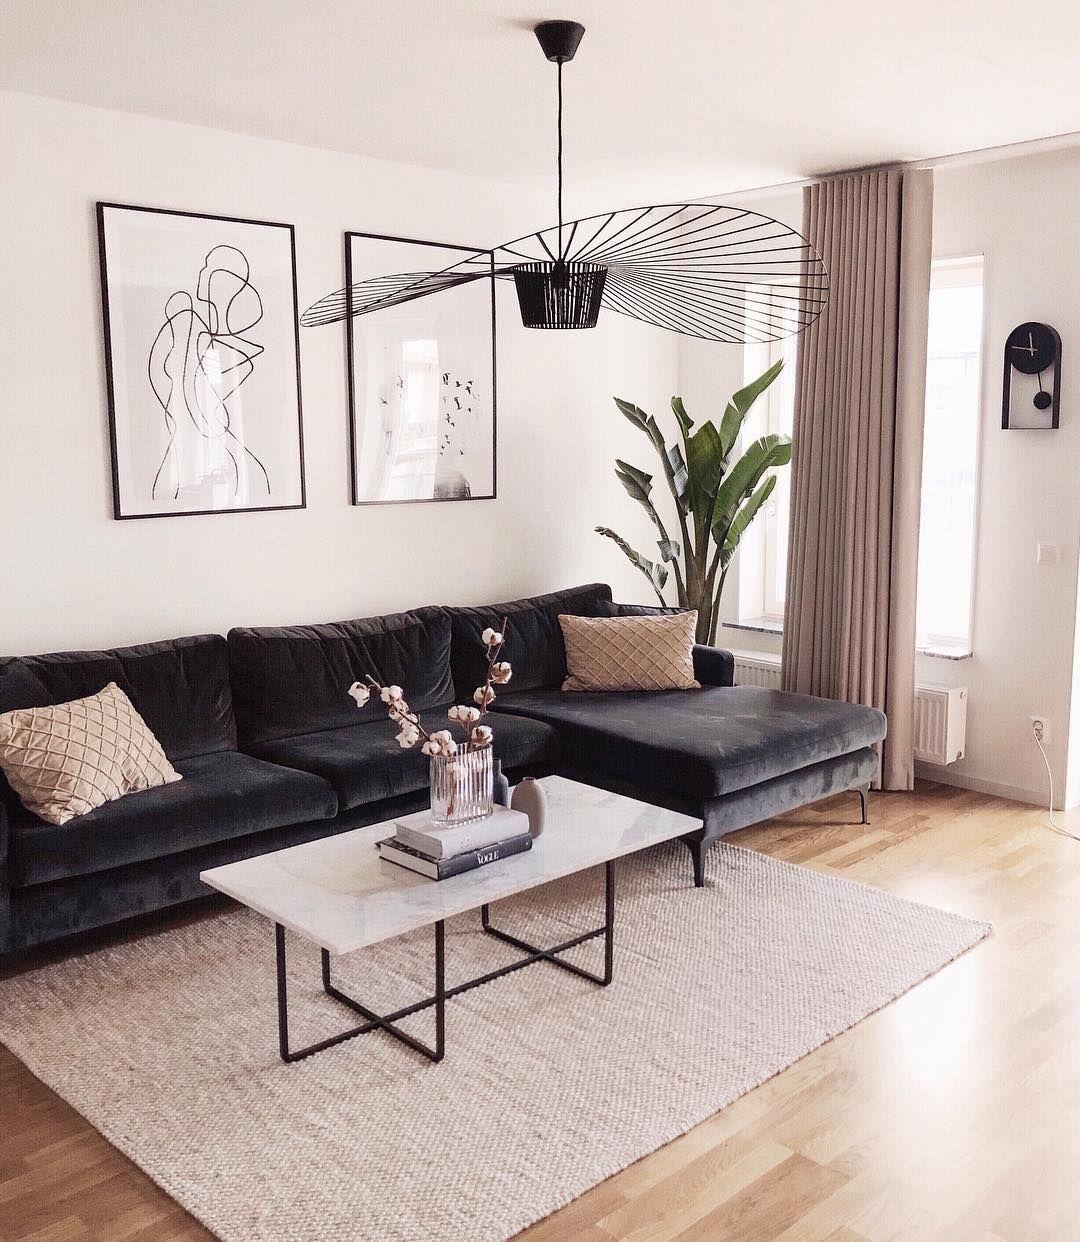 Trendy Home Decor Idea To Copy This Season Minimalist Living Room Living Room Scandinavian Small Apartment Living Room